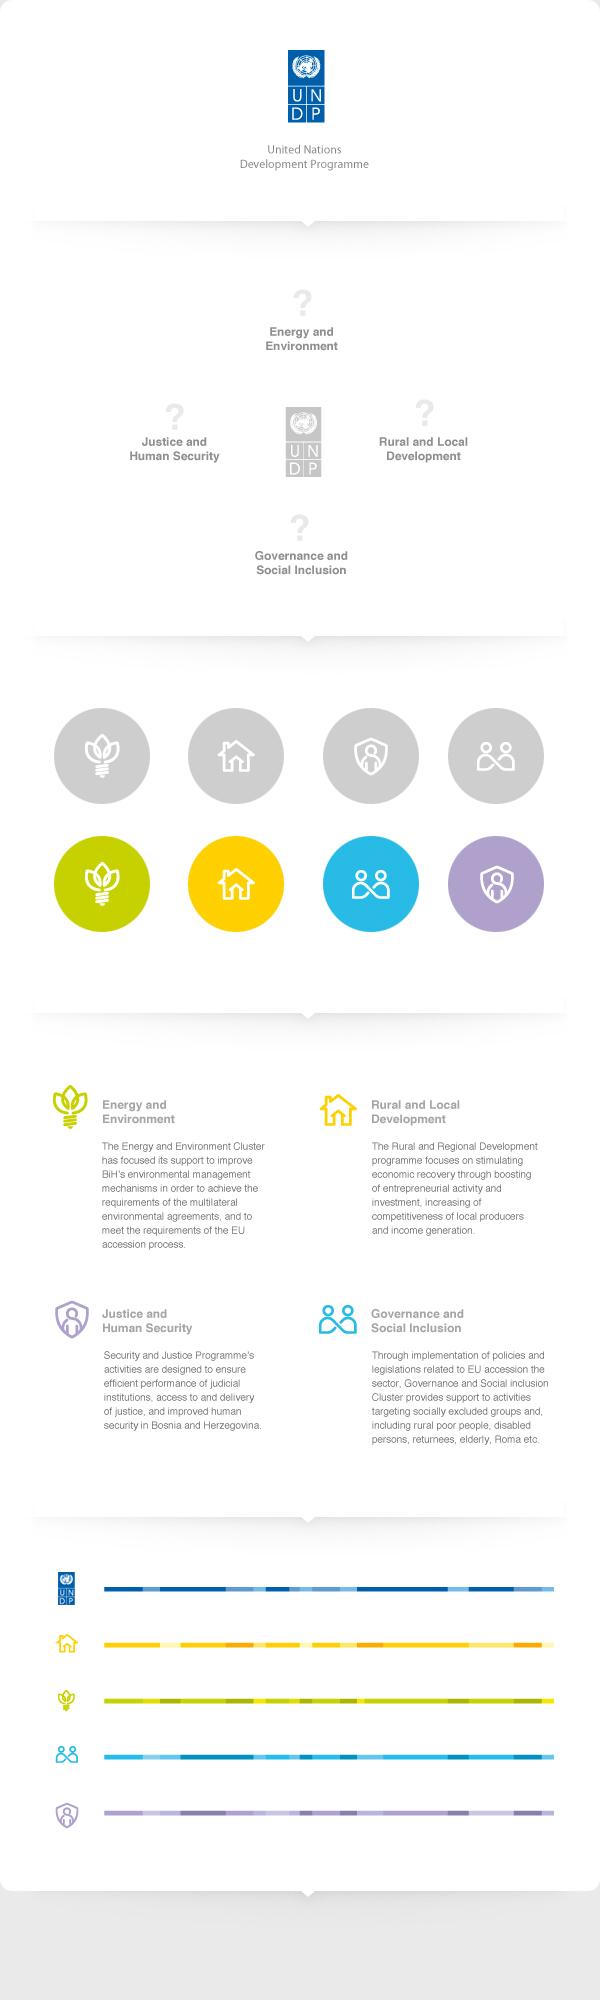 United Nations Development Programe Corporate Identity By Kresimir Kraljevic Via Behance Corporate Identity Brand Architecture Brand Identity Design